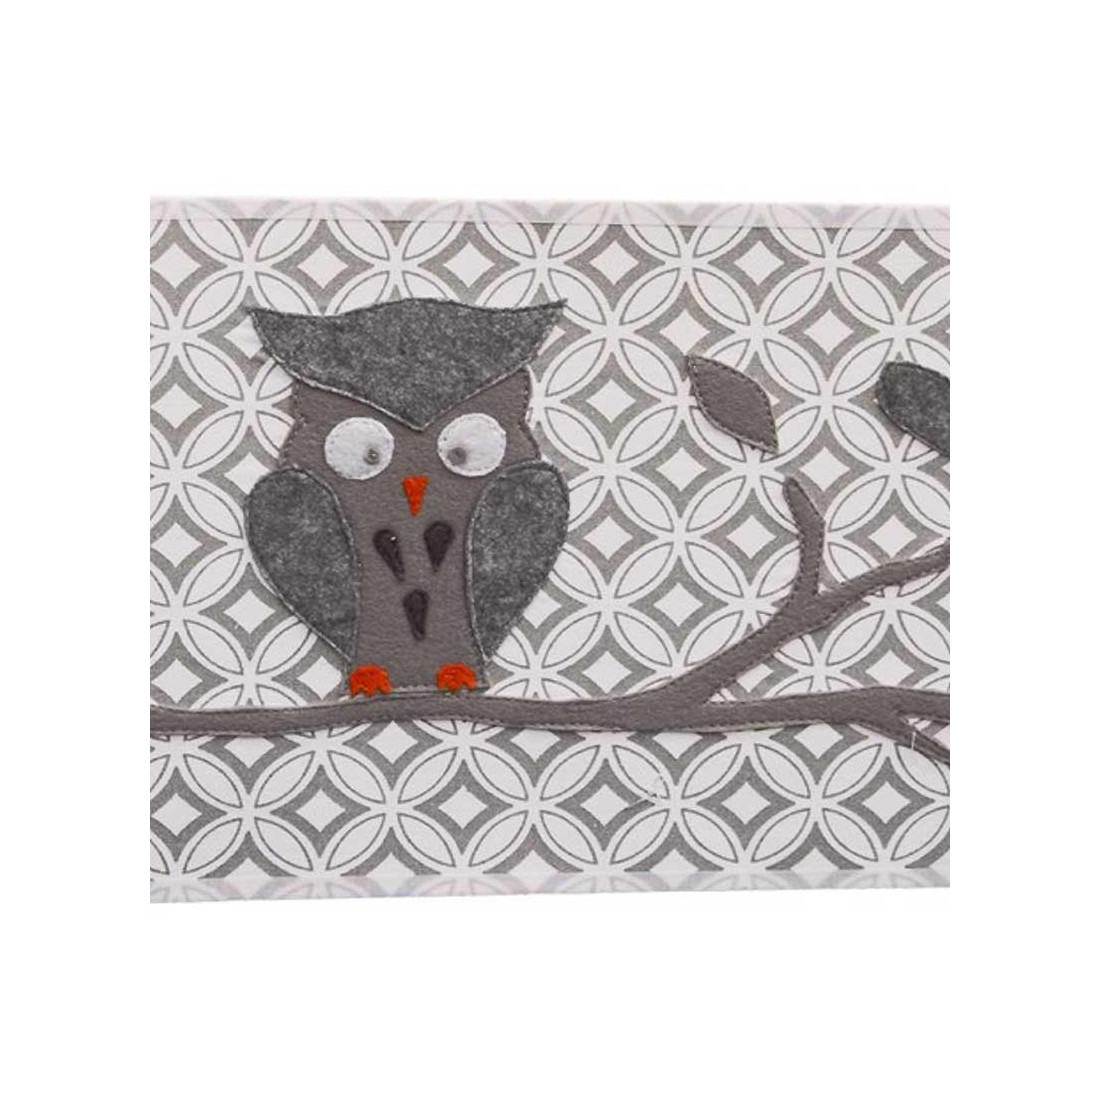 applique murale enfant chouette grise taftan ma chambramoi. Black Bedroom Furniture Sets. Home Design Ideas